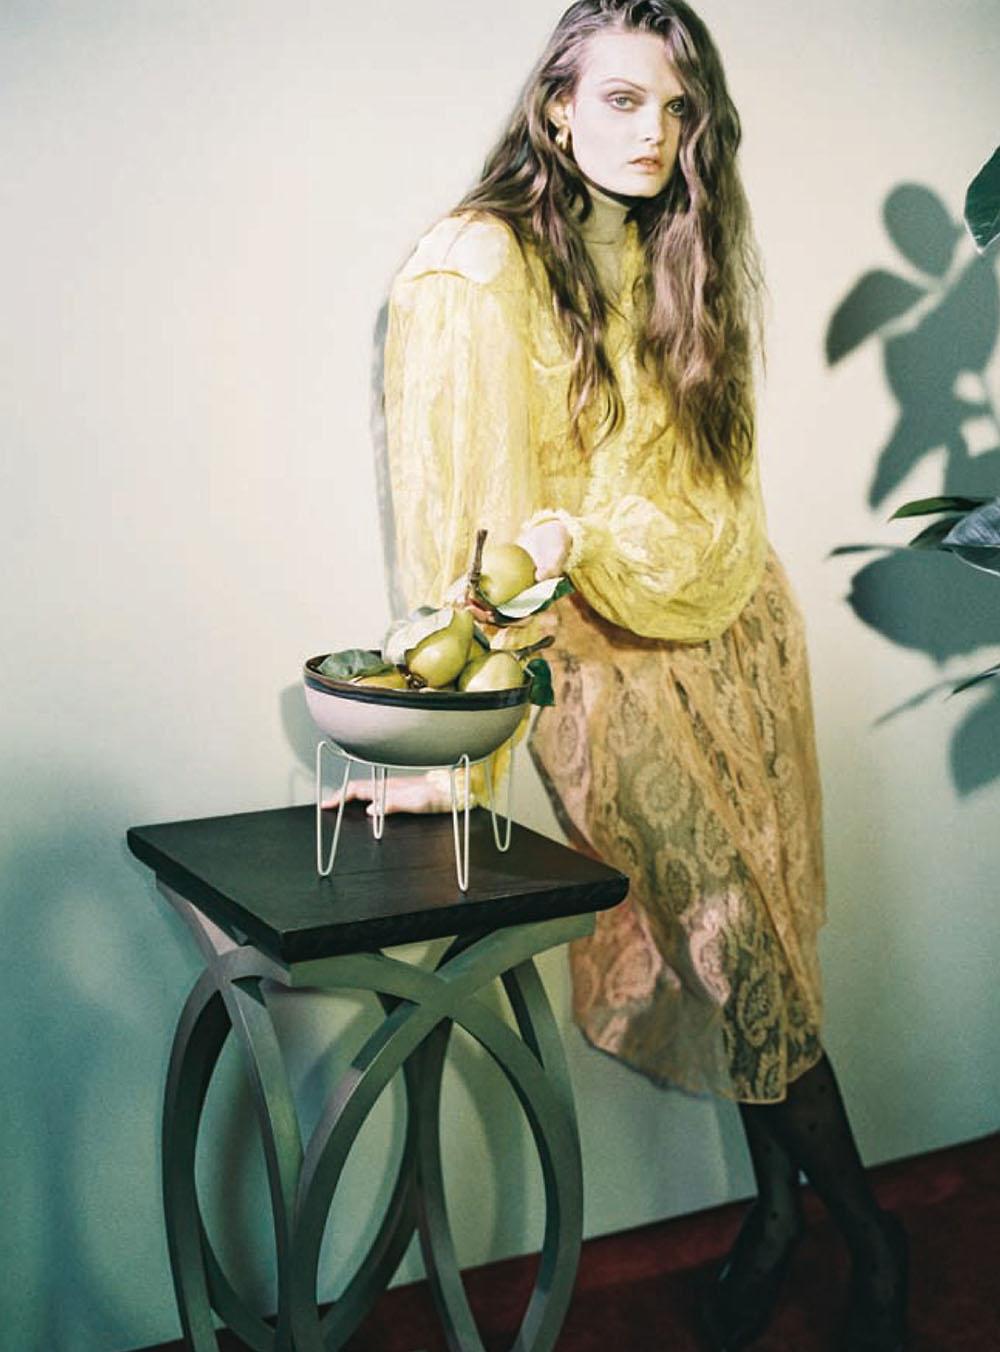 Lulu Tenney by Heji Shin for Vogue China November 2020